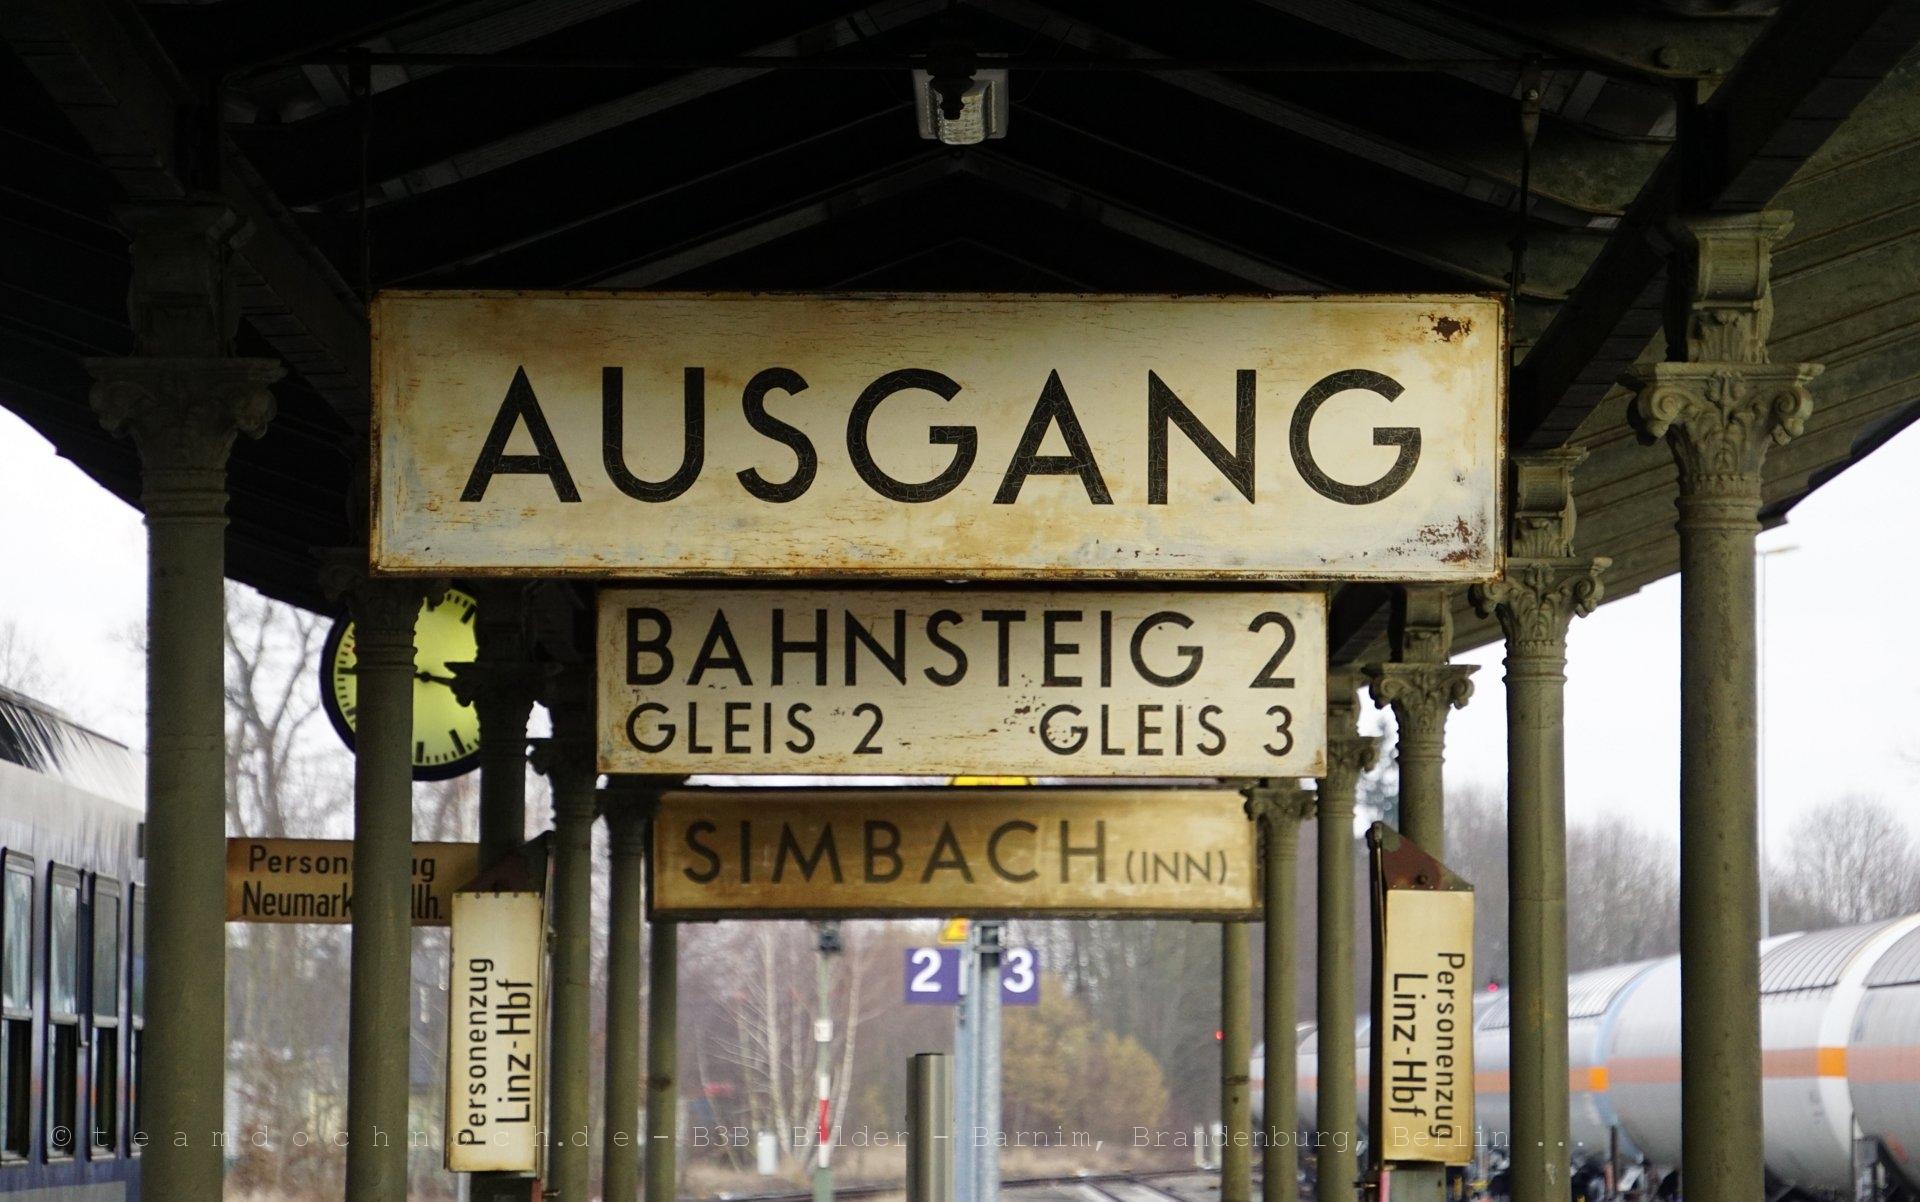 Ausgang Bahnsteig 2 Simbach (Inn)